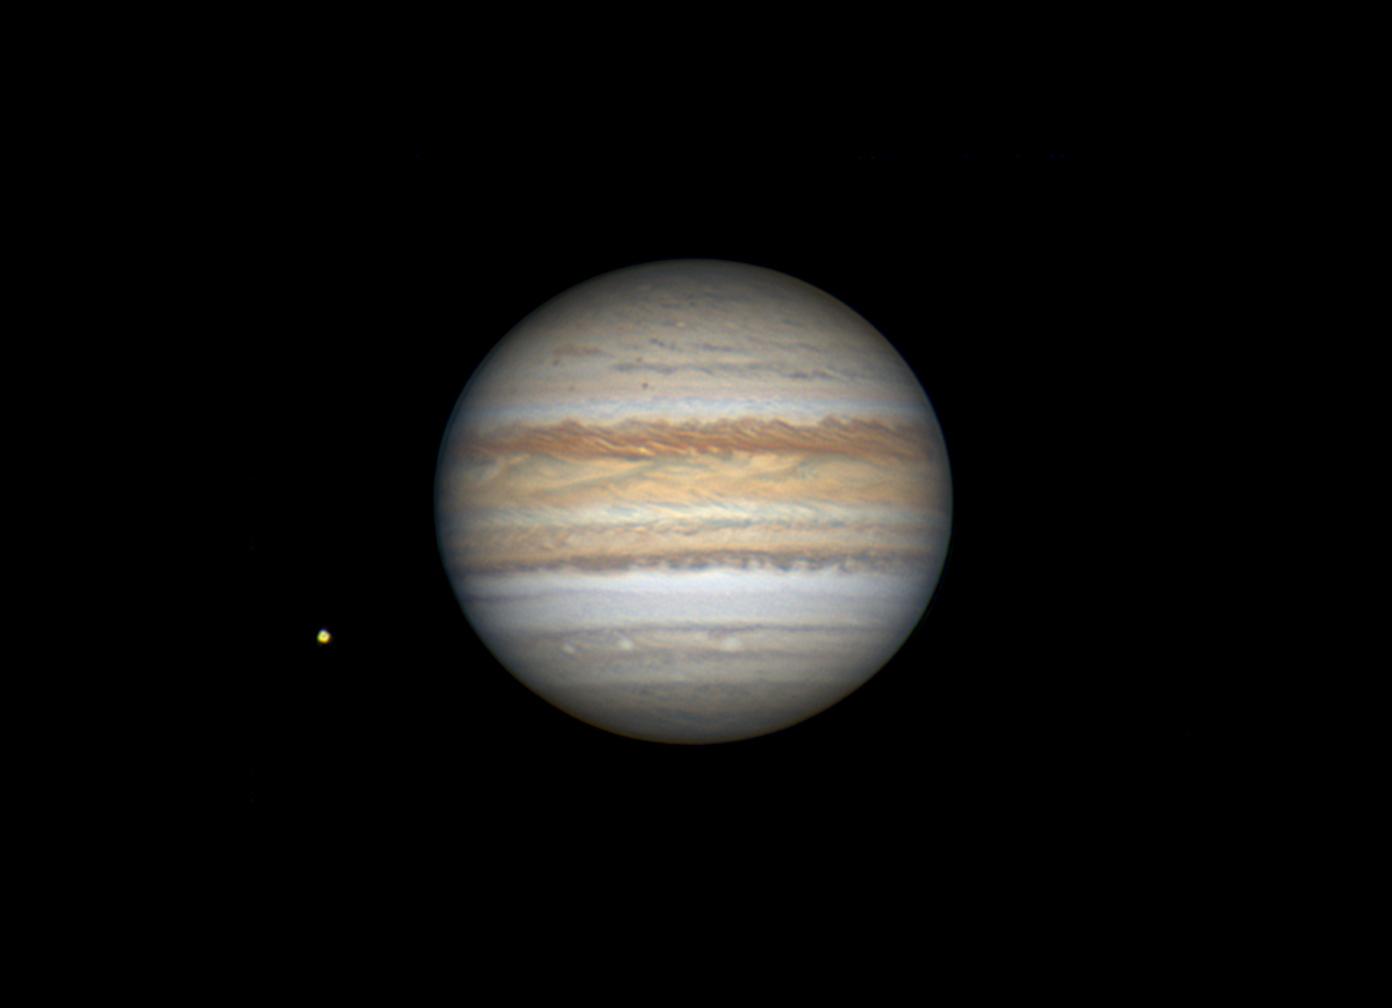 5d11272a8b9b7_Jupiter0136426722.jpg.05e61d3b86128eadbb1dd330095dbe49.jpg